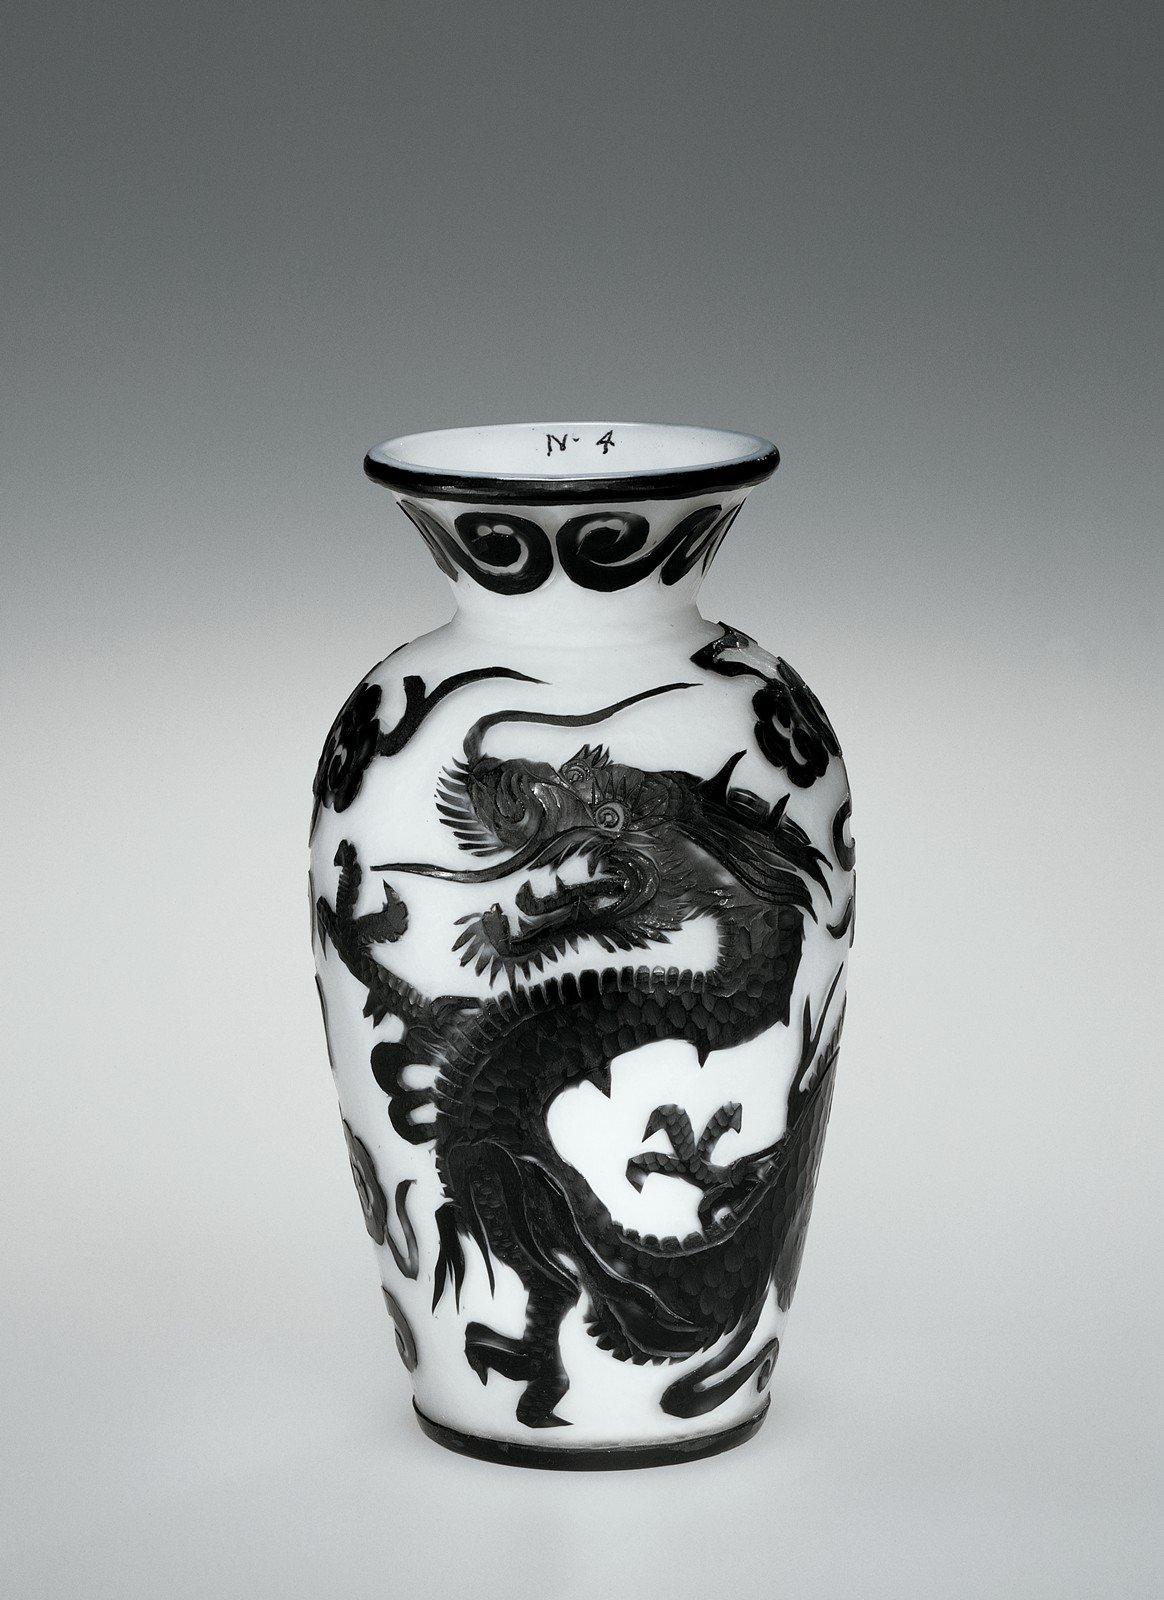 Cameo Vase (98.2.7), Joshua Hodgetts, maker